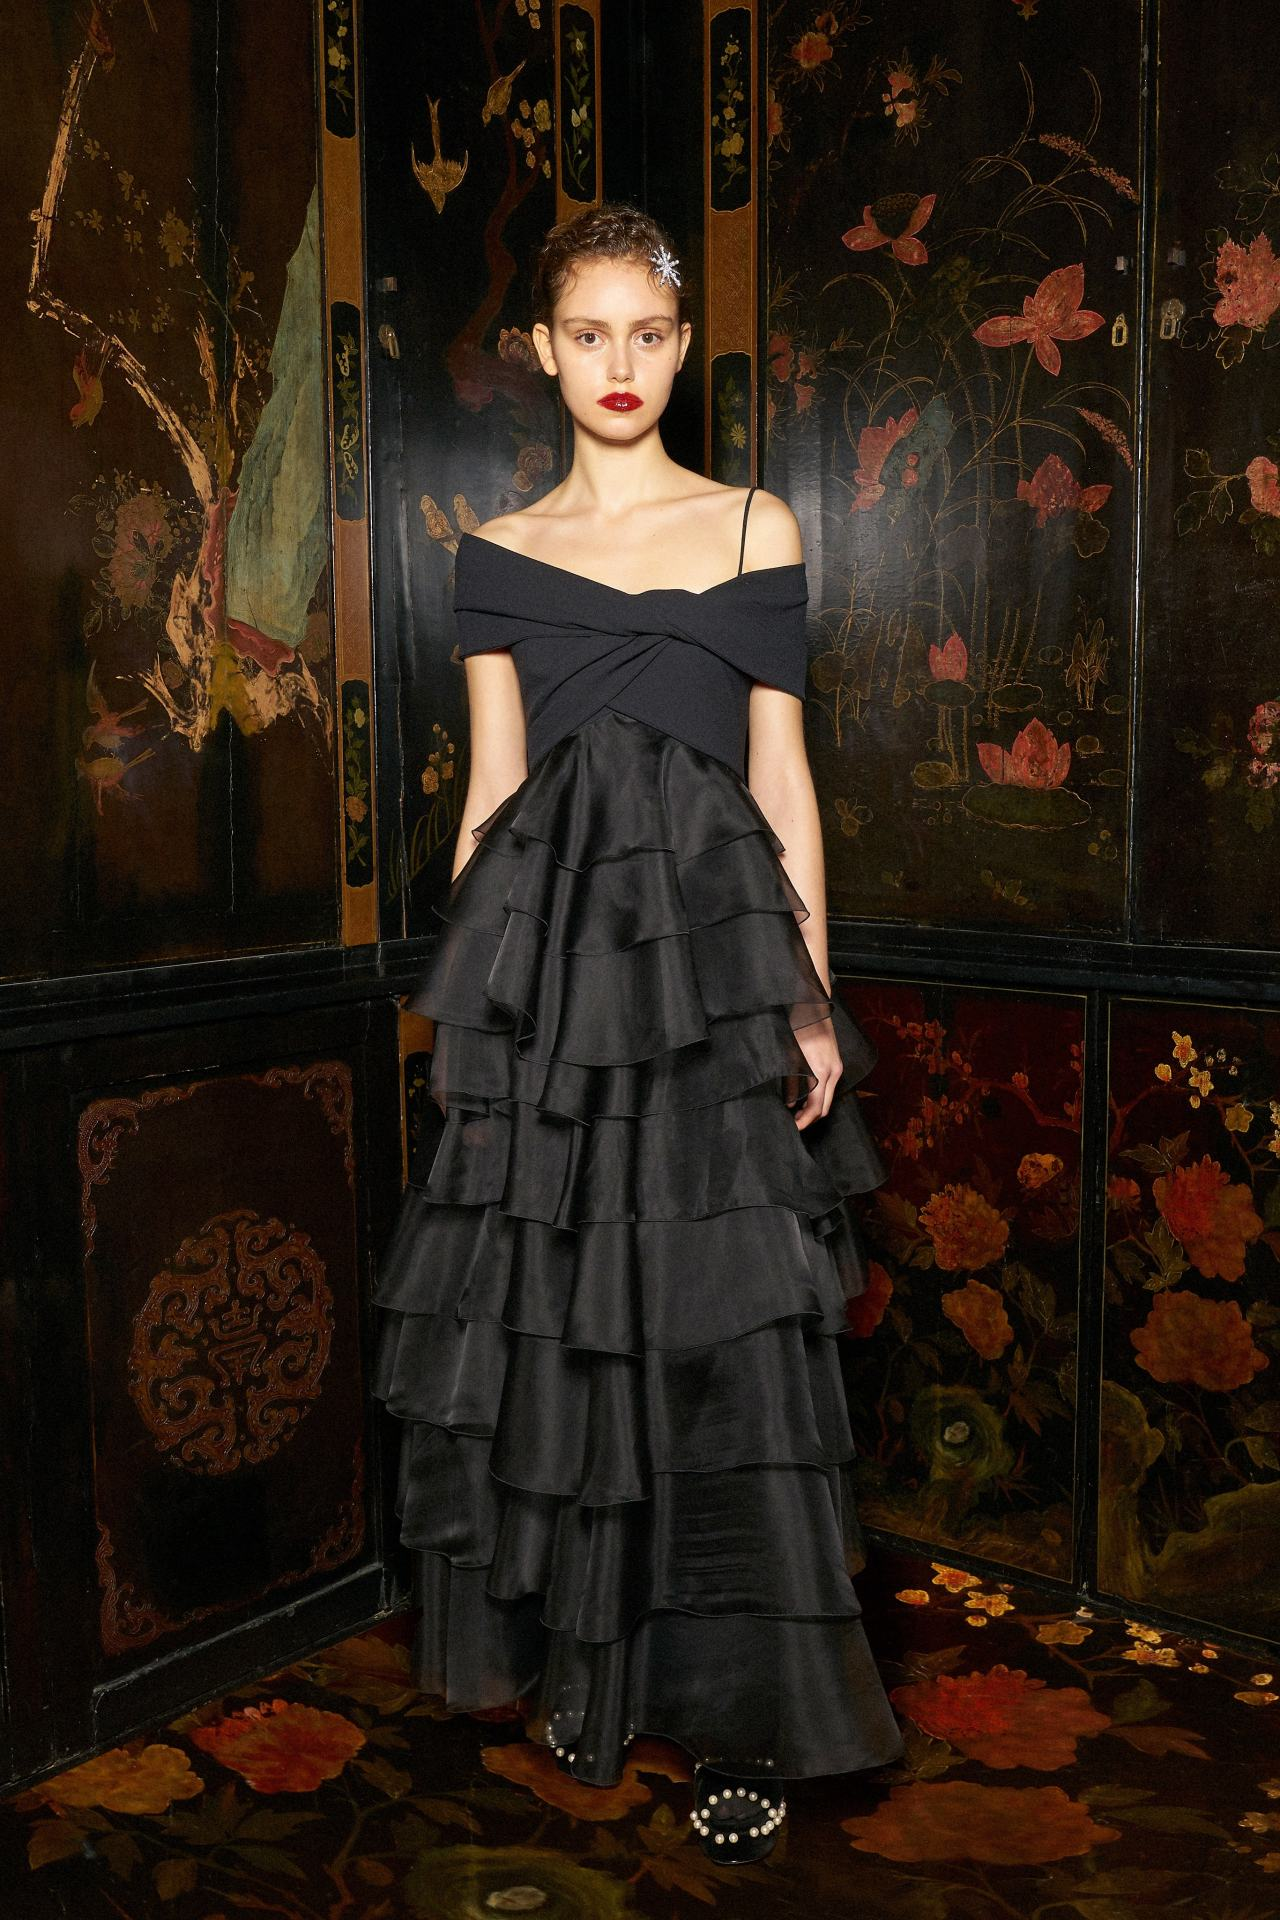 #dress#long dress#black dress#model#giambattista valli#fashion#style#trend#glam#glamour